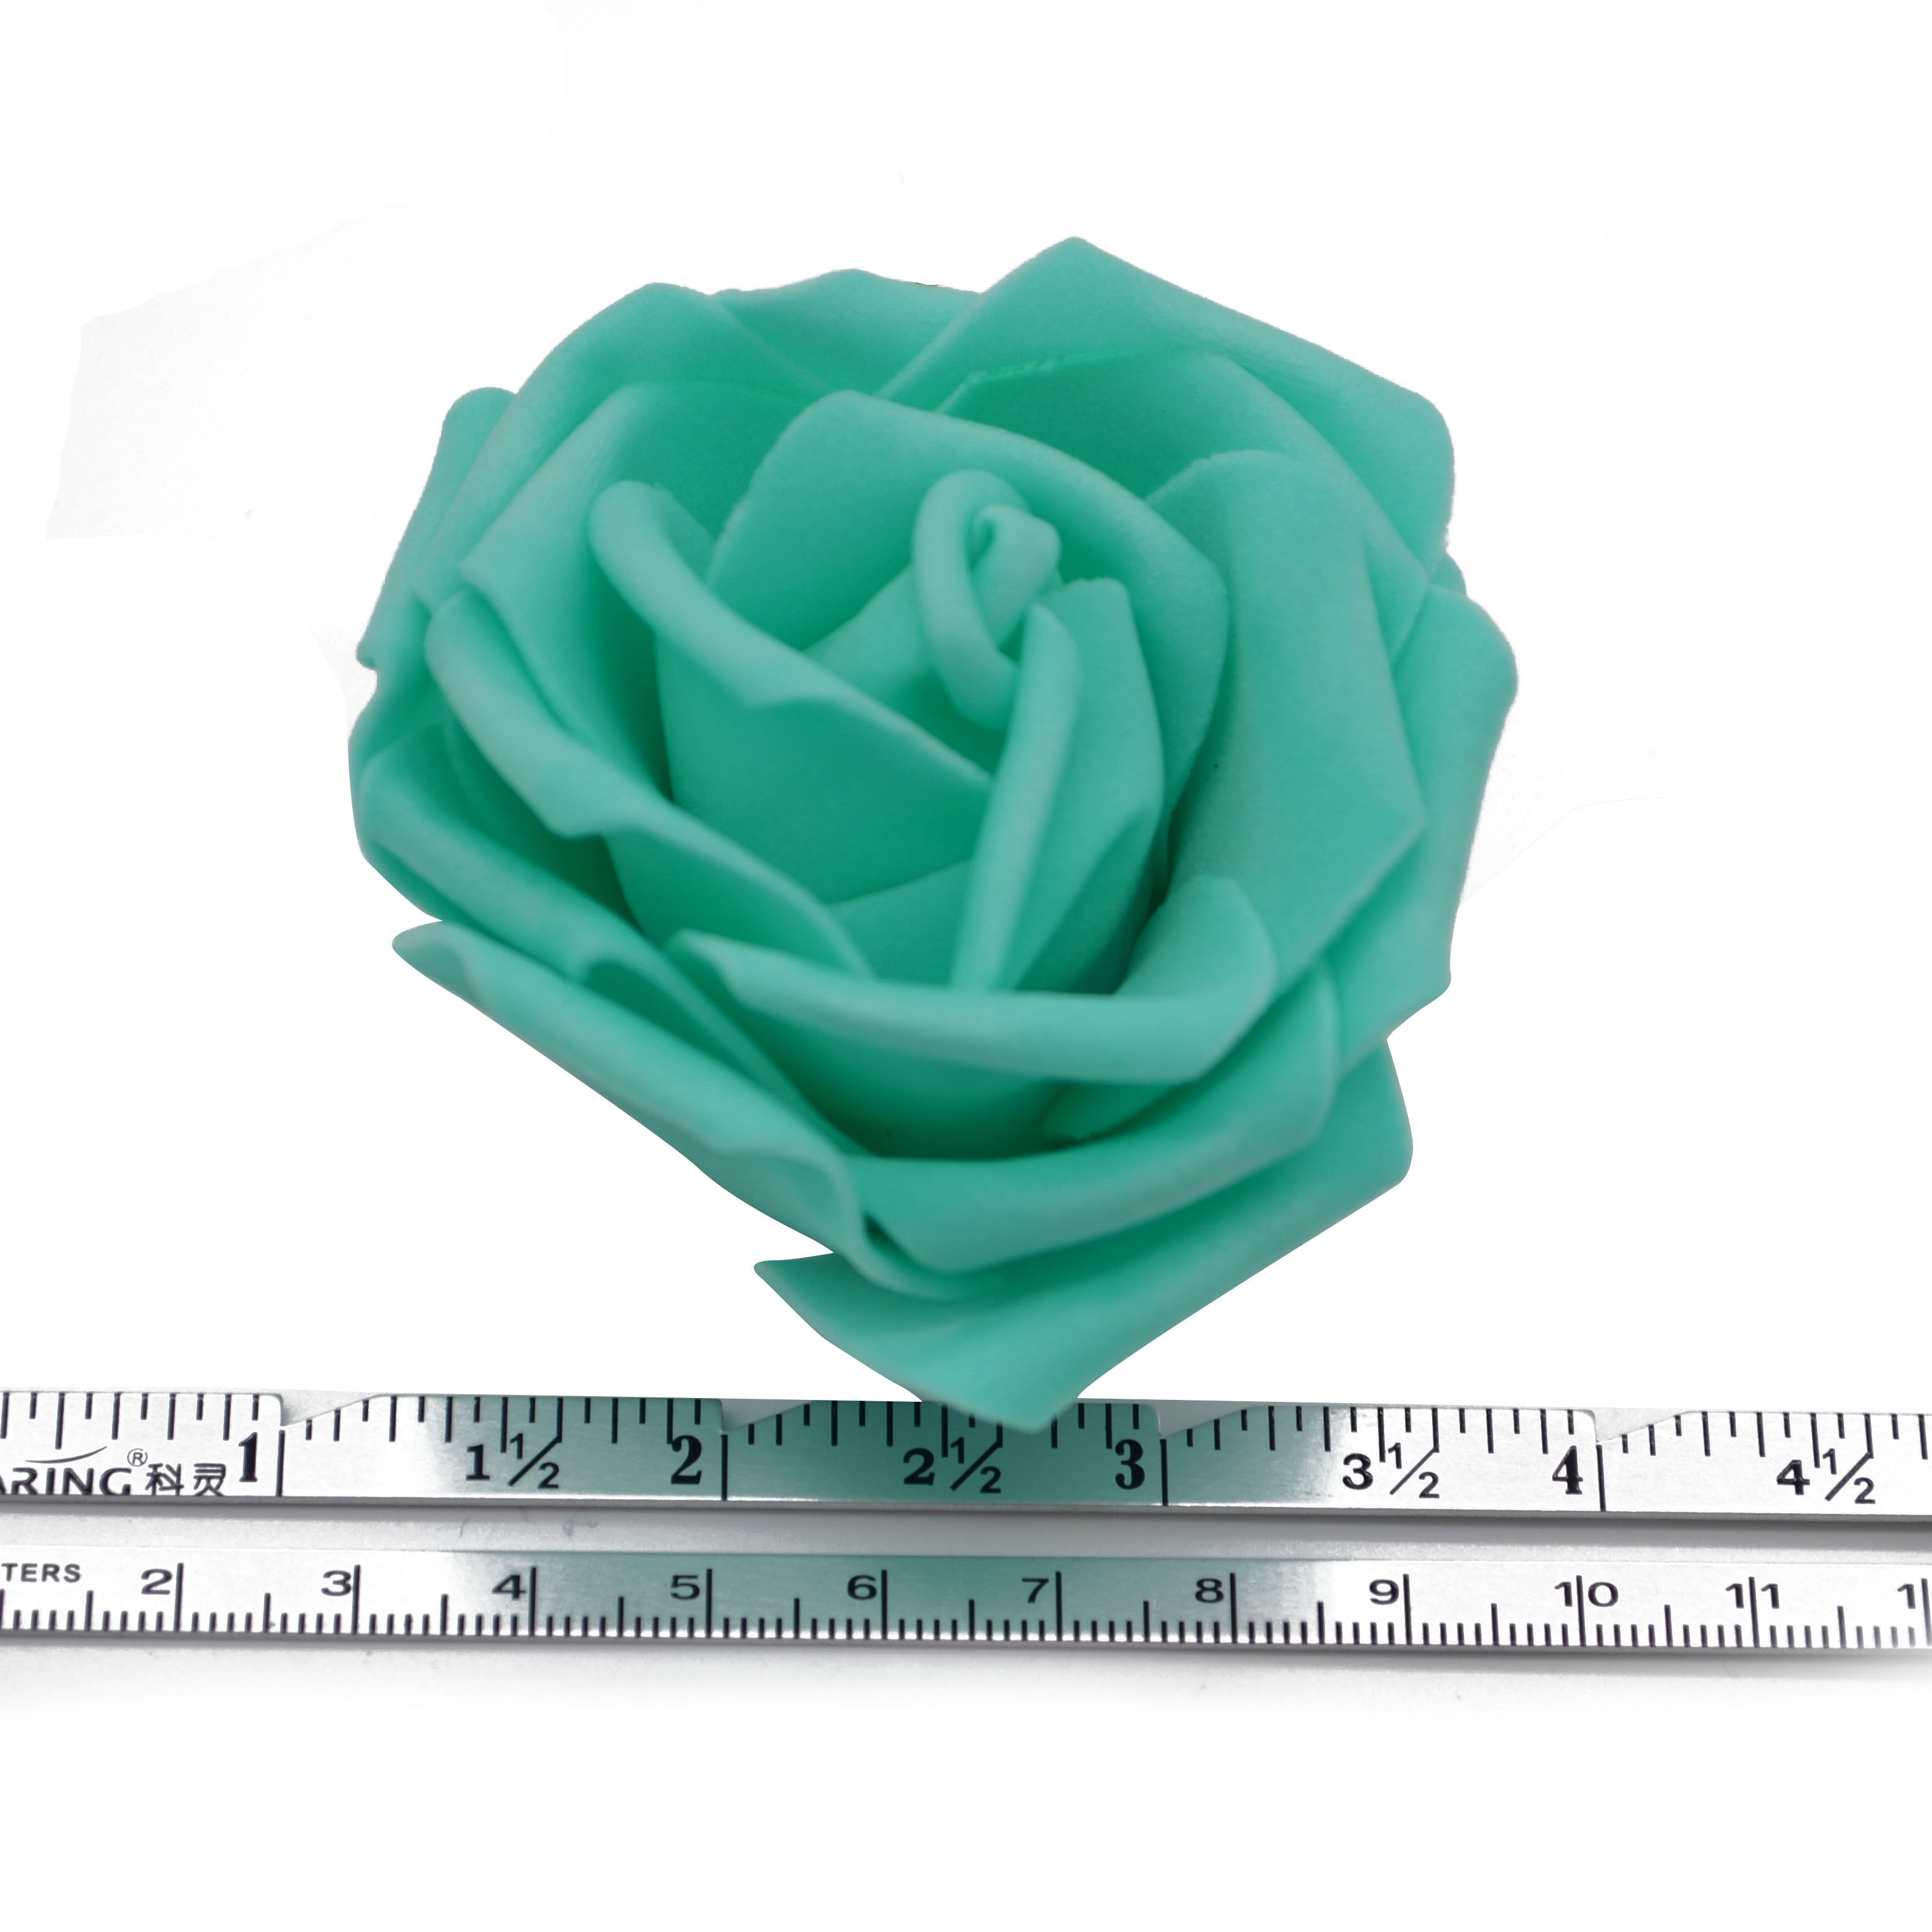 30Pcs/lot 8cm PE Foam Rose Artificial Flower Heads For Decorative Wreaths Wedding Event Party Decoration Home Garden Supplies